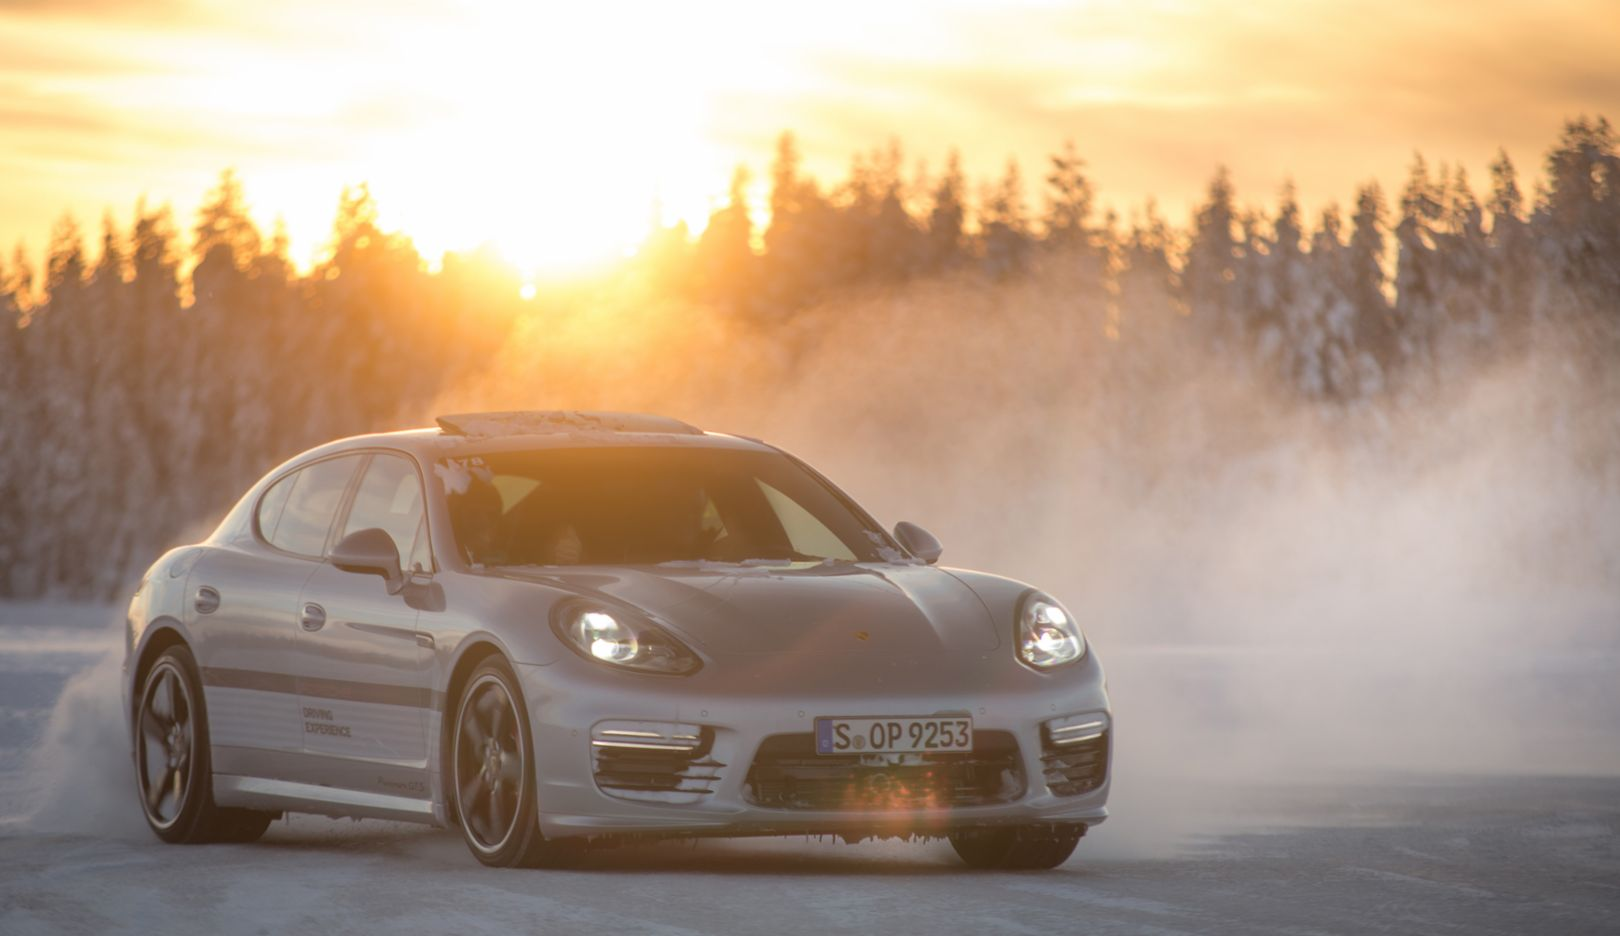 Panamera, Porsche Driving Experience, Ice Force, Levi, Finland, 2015, Porsche AG